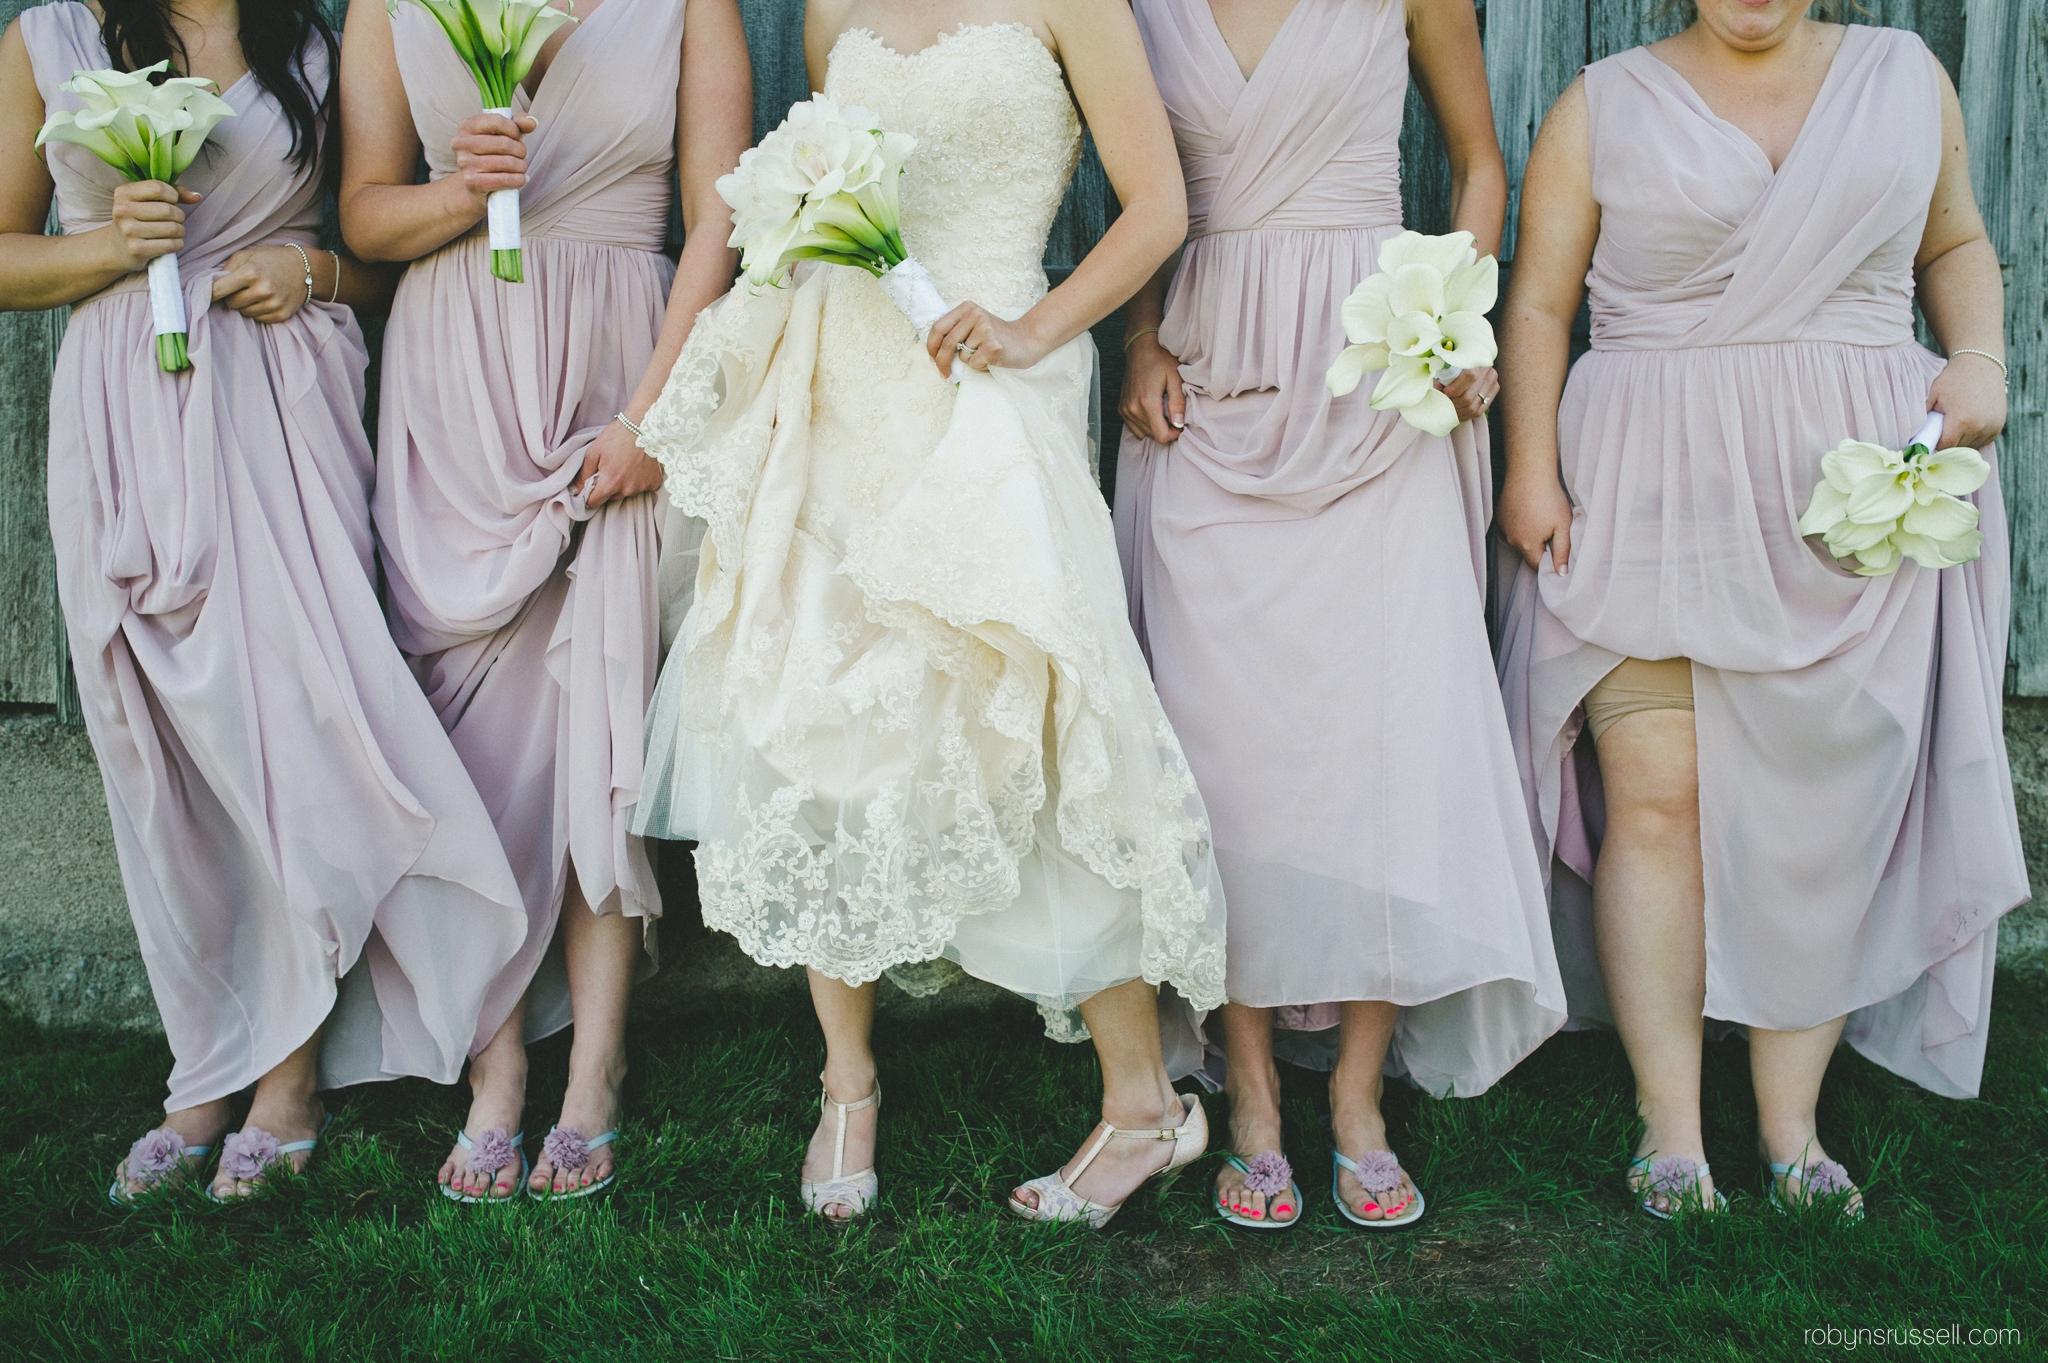 33-bride-and-bridesmaids-shoes-details.jpg